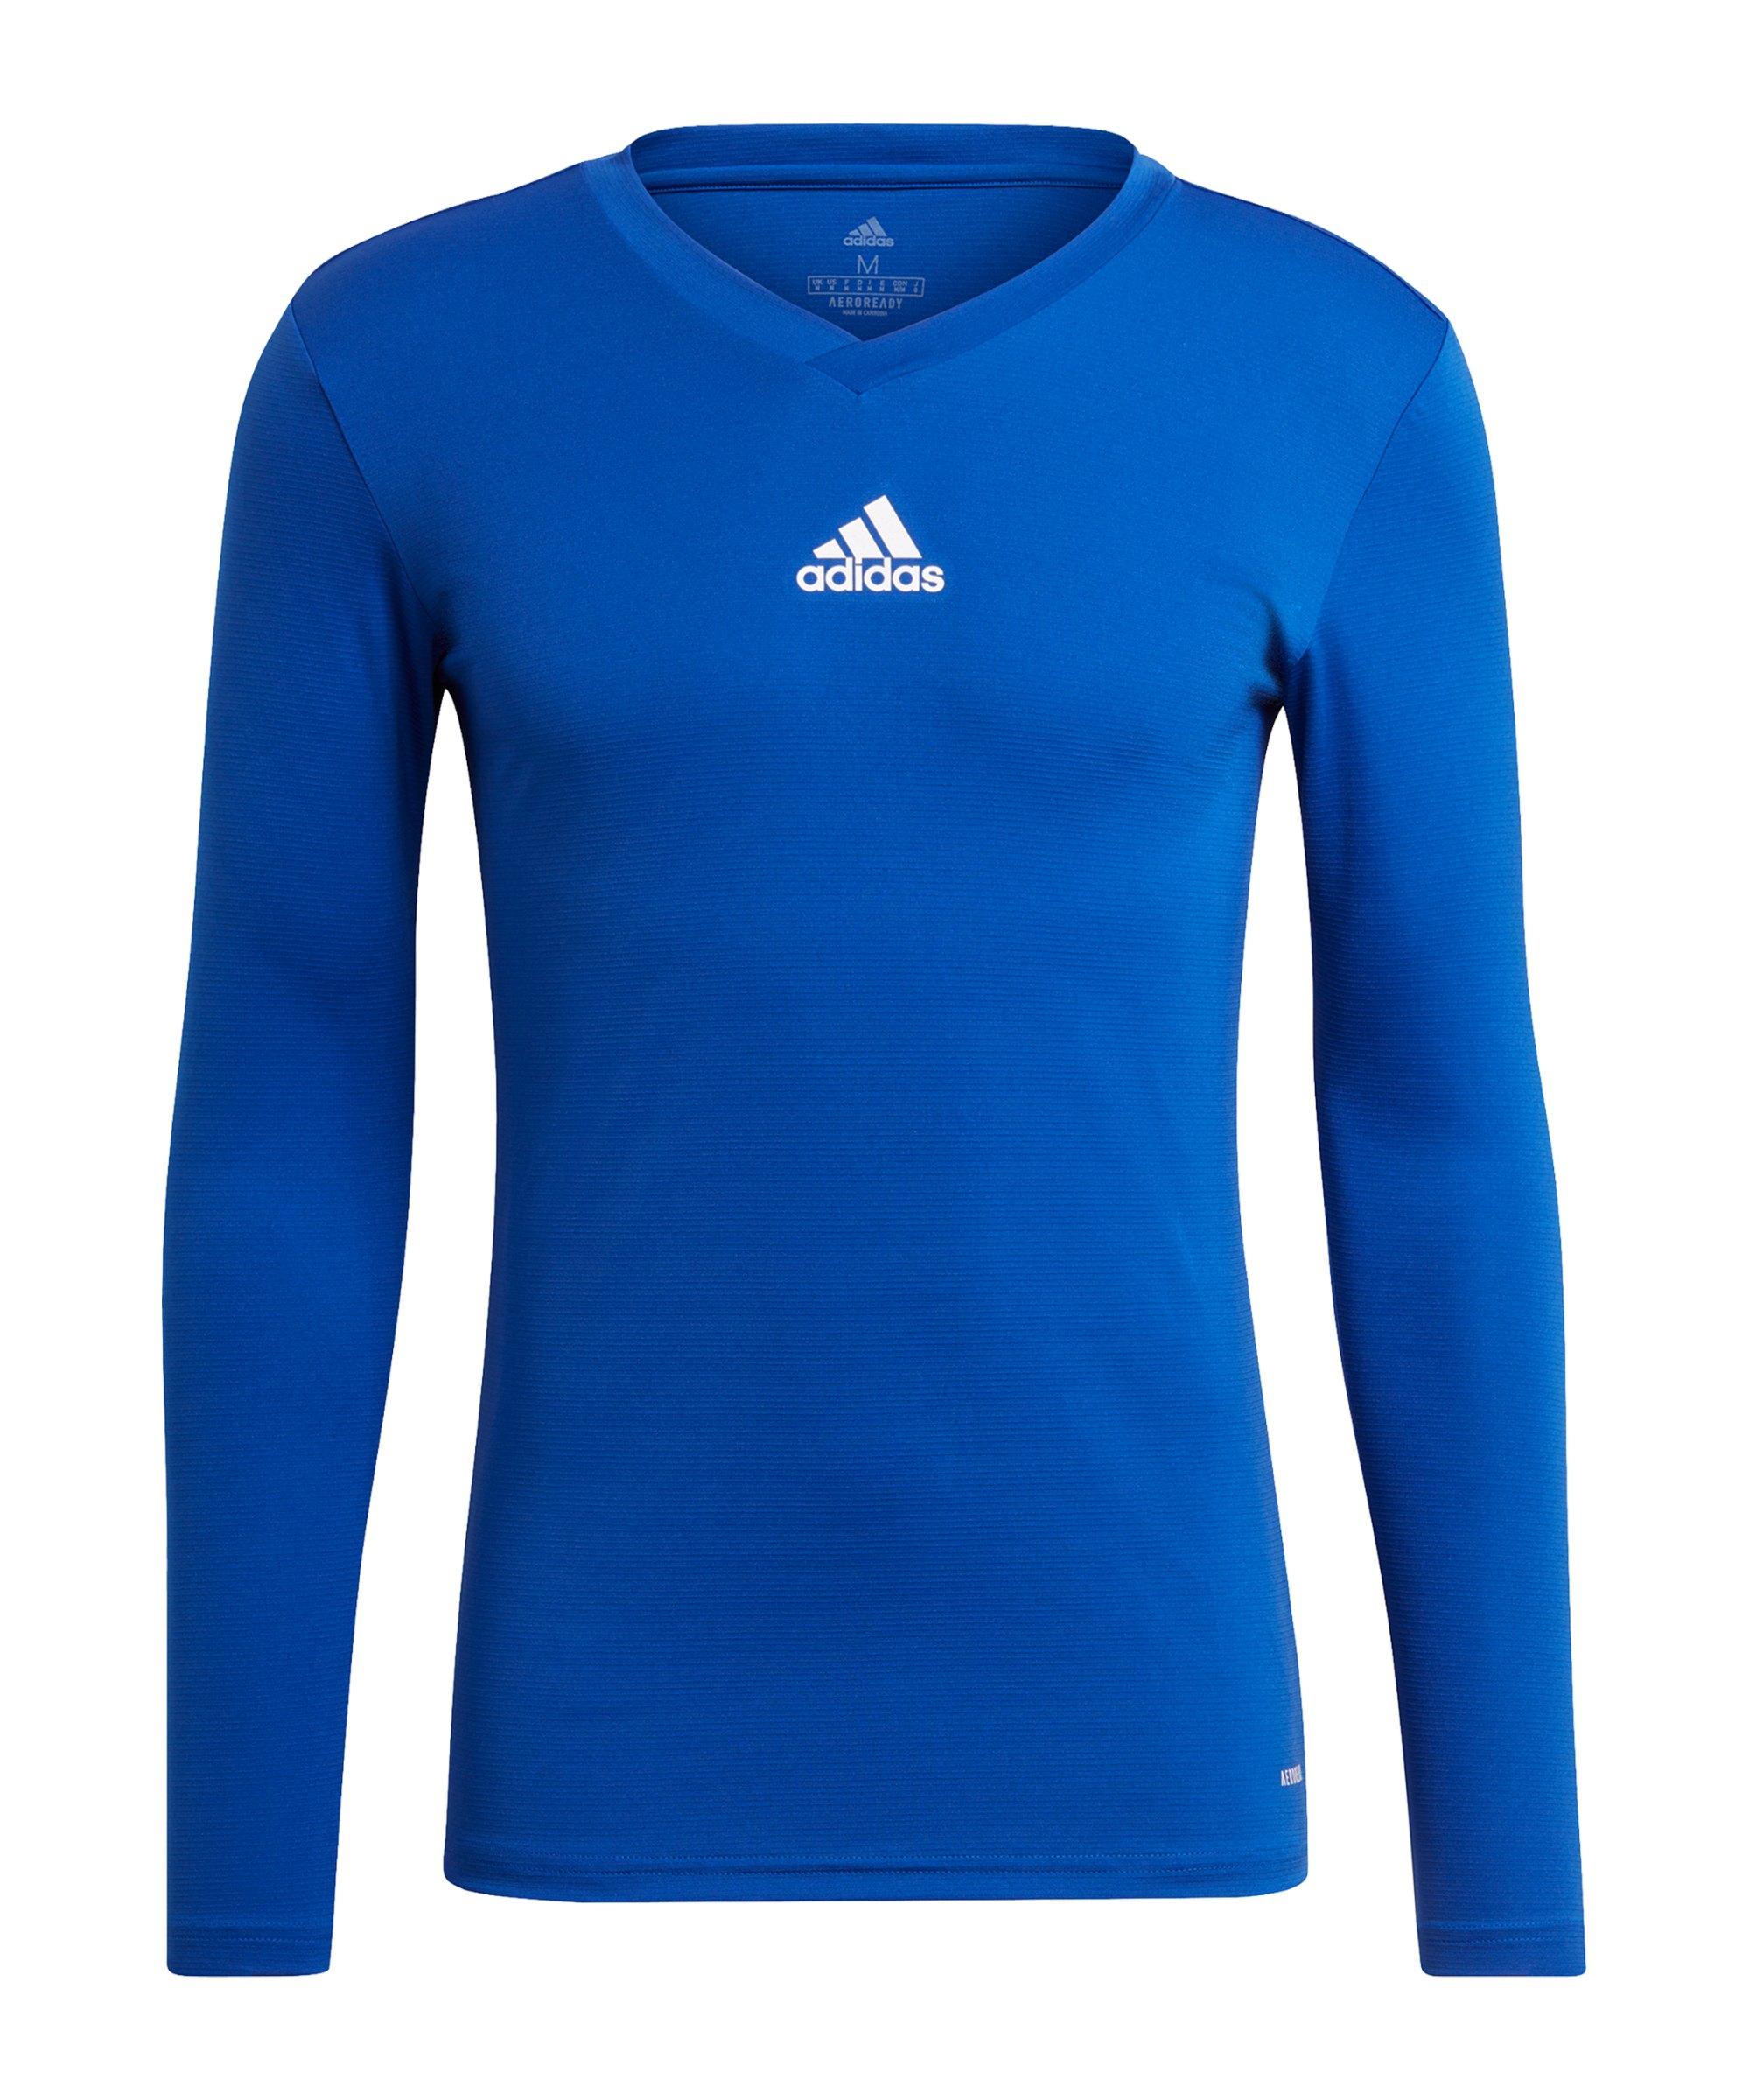 adidas Team Base Top langarm Blau Weiss - blau